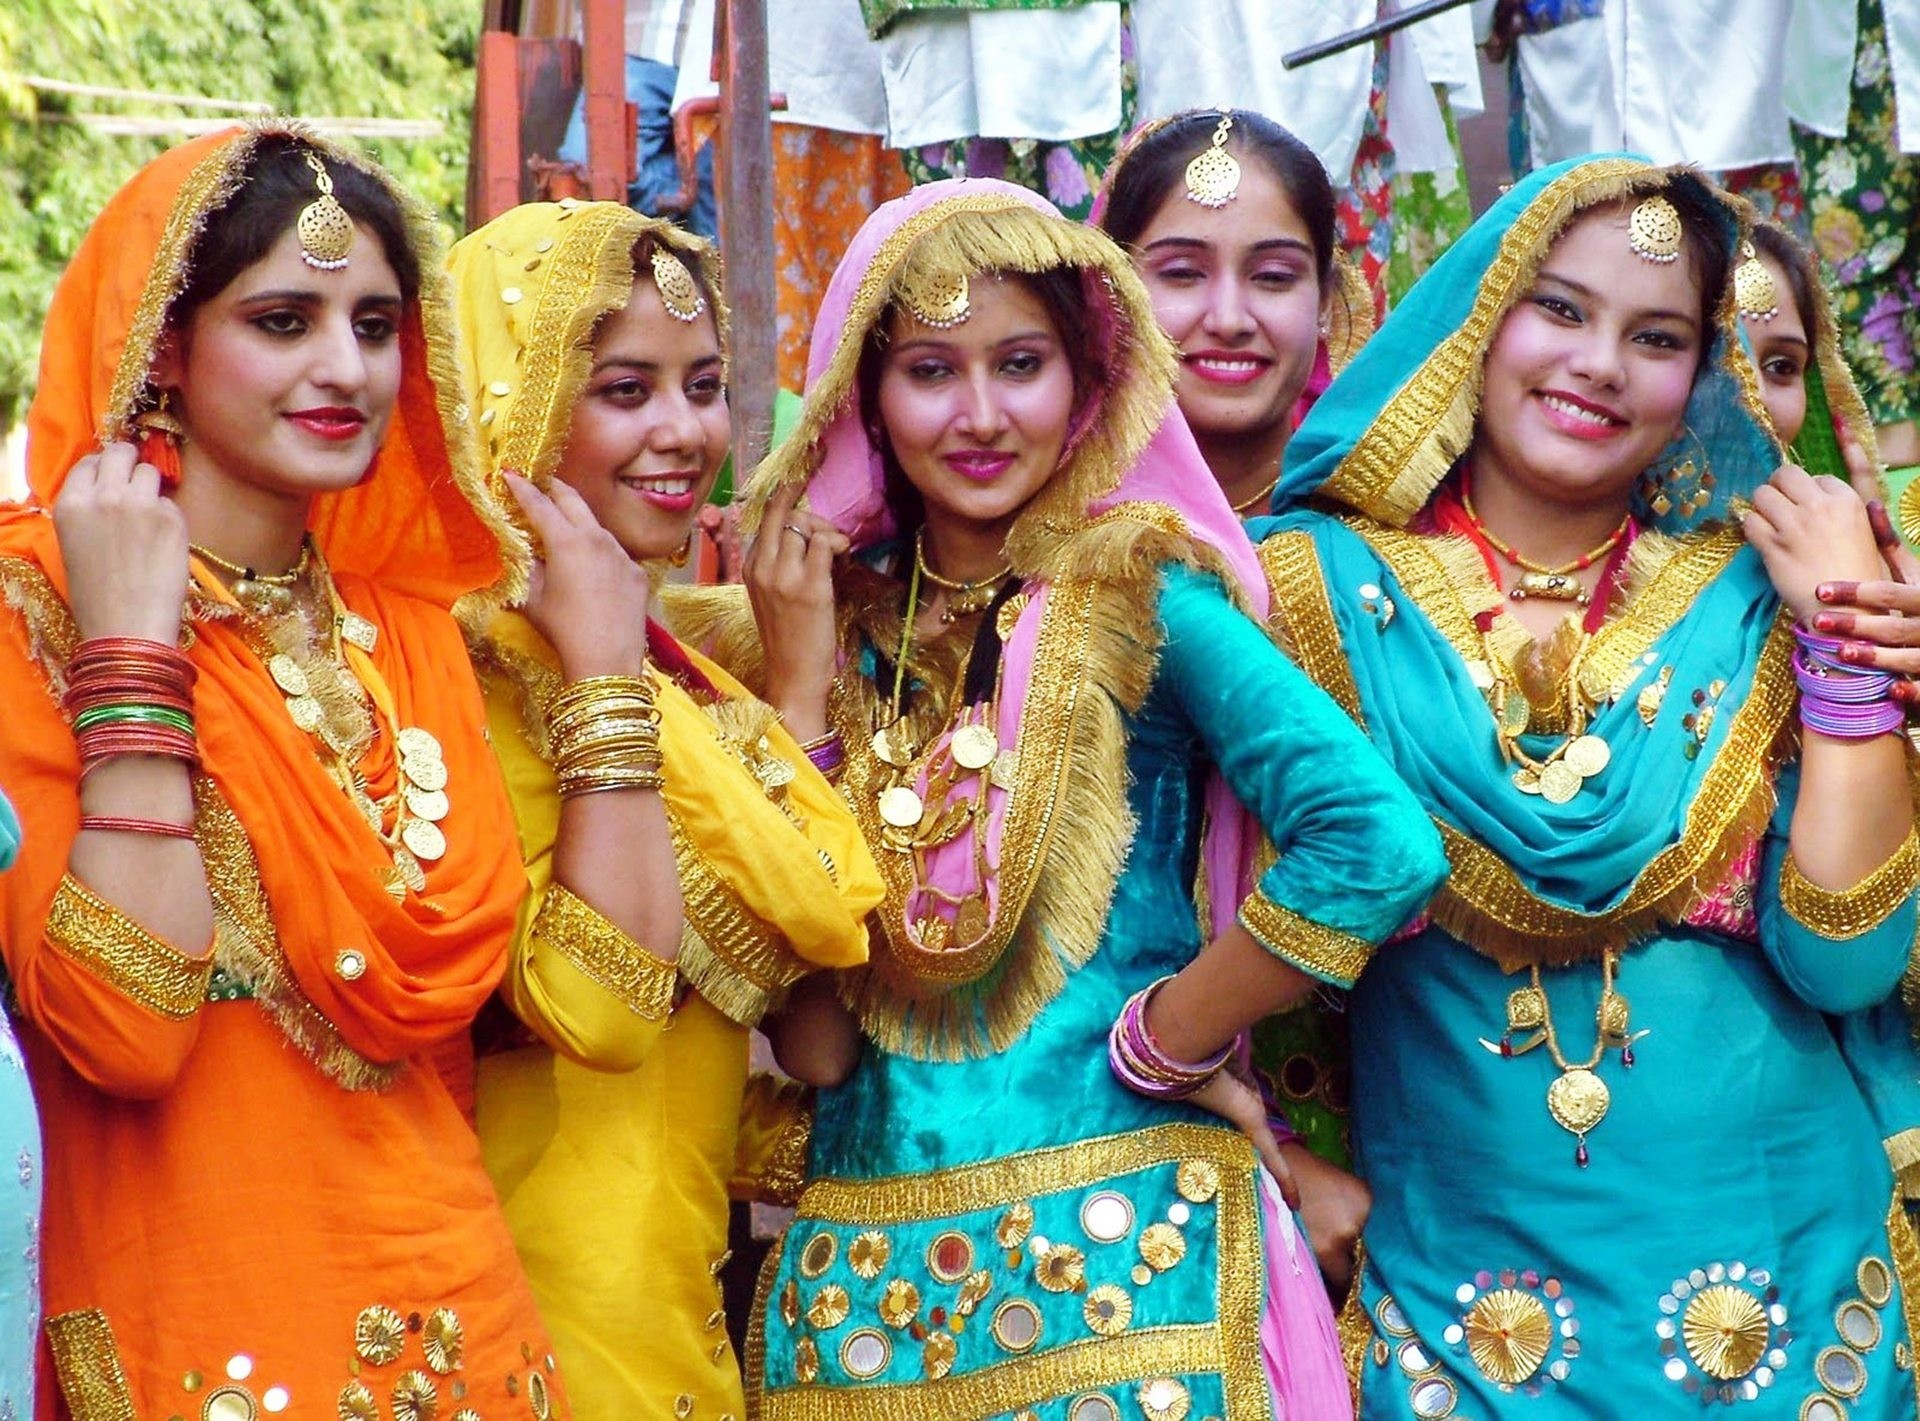 Punjabi Girls Group Phtos and Wallpaper for Desktop